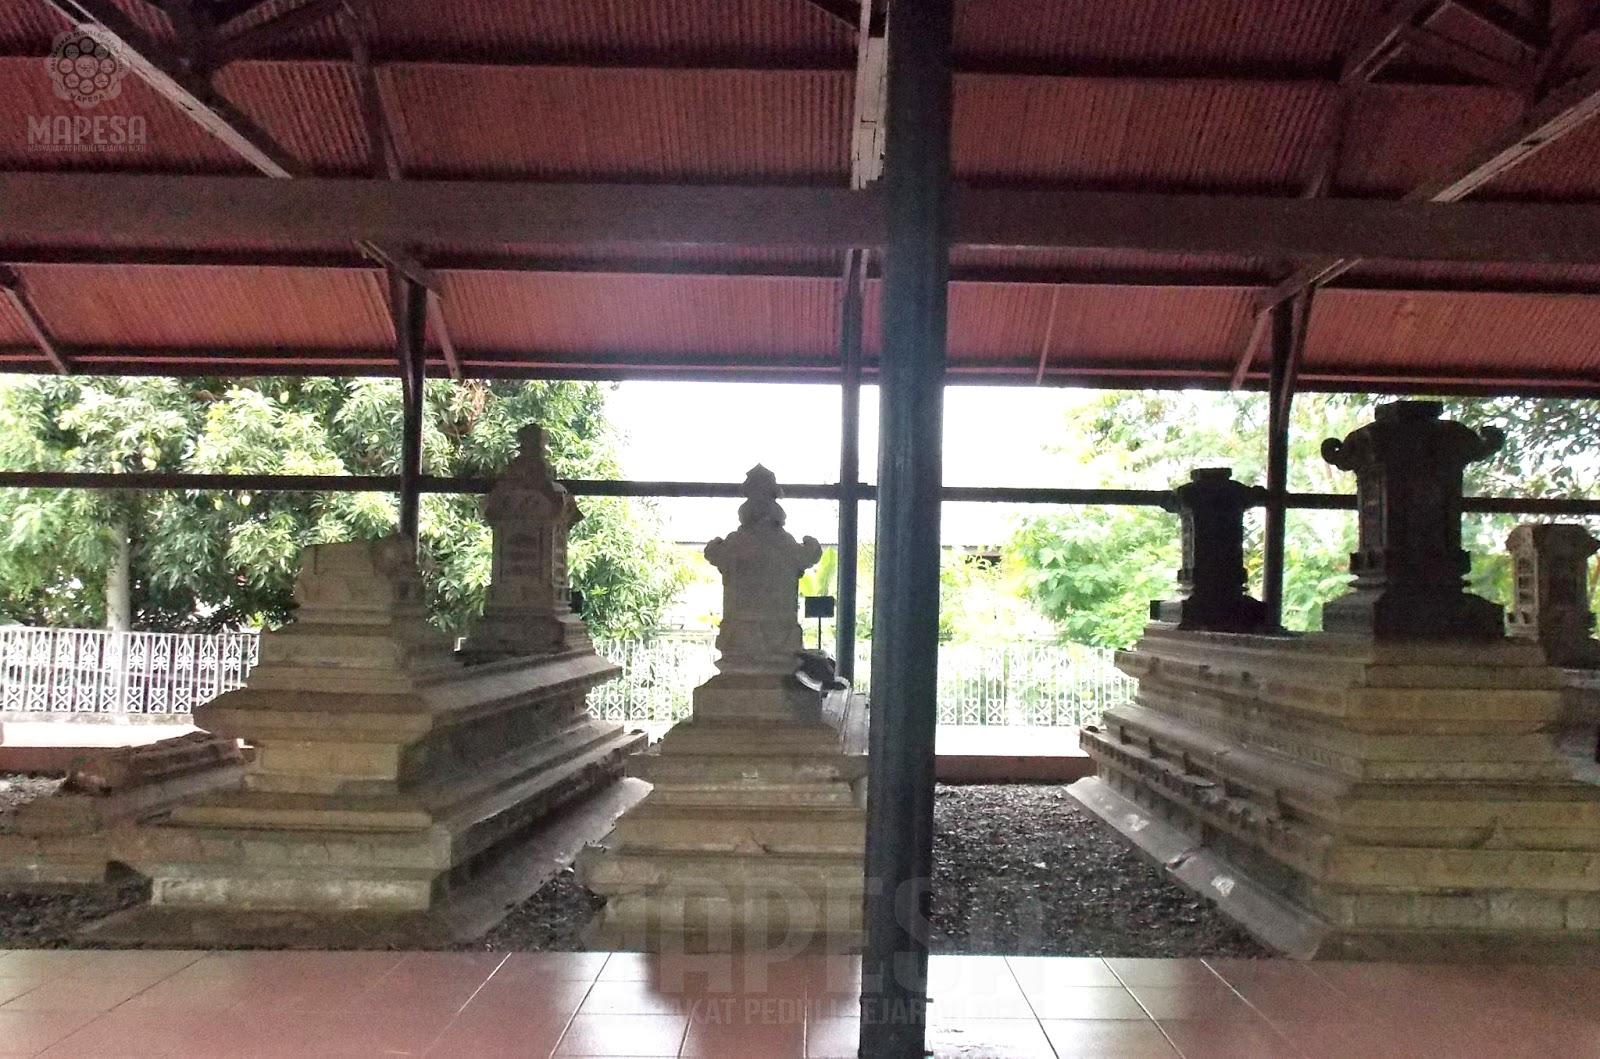 Malaka Hati Penguasa Aceh Darussalam Mapesa Kandang 12 Baiturrijal Makam